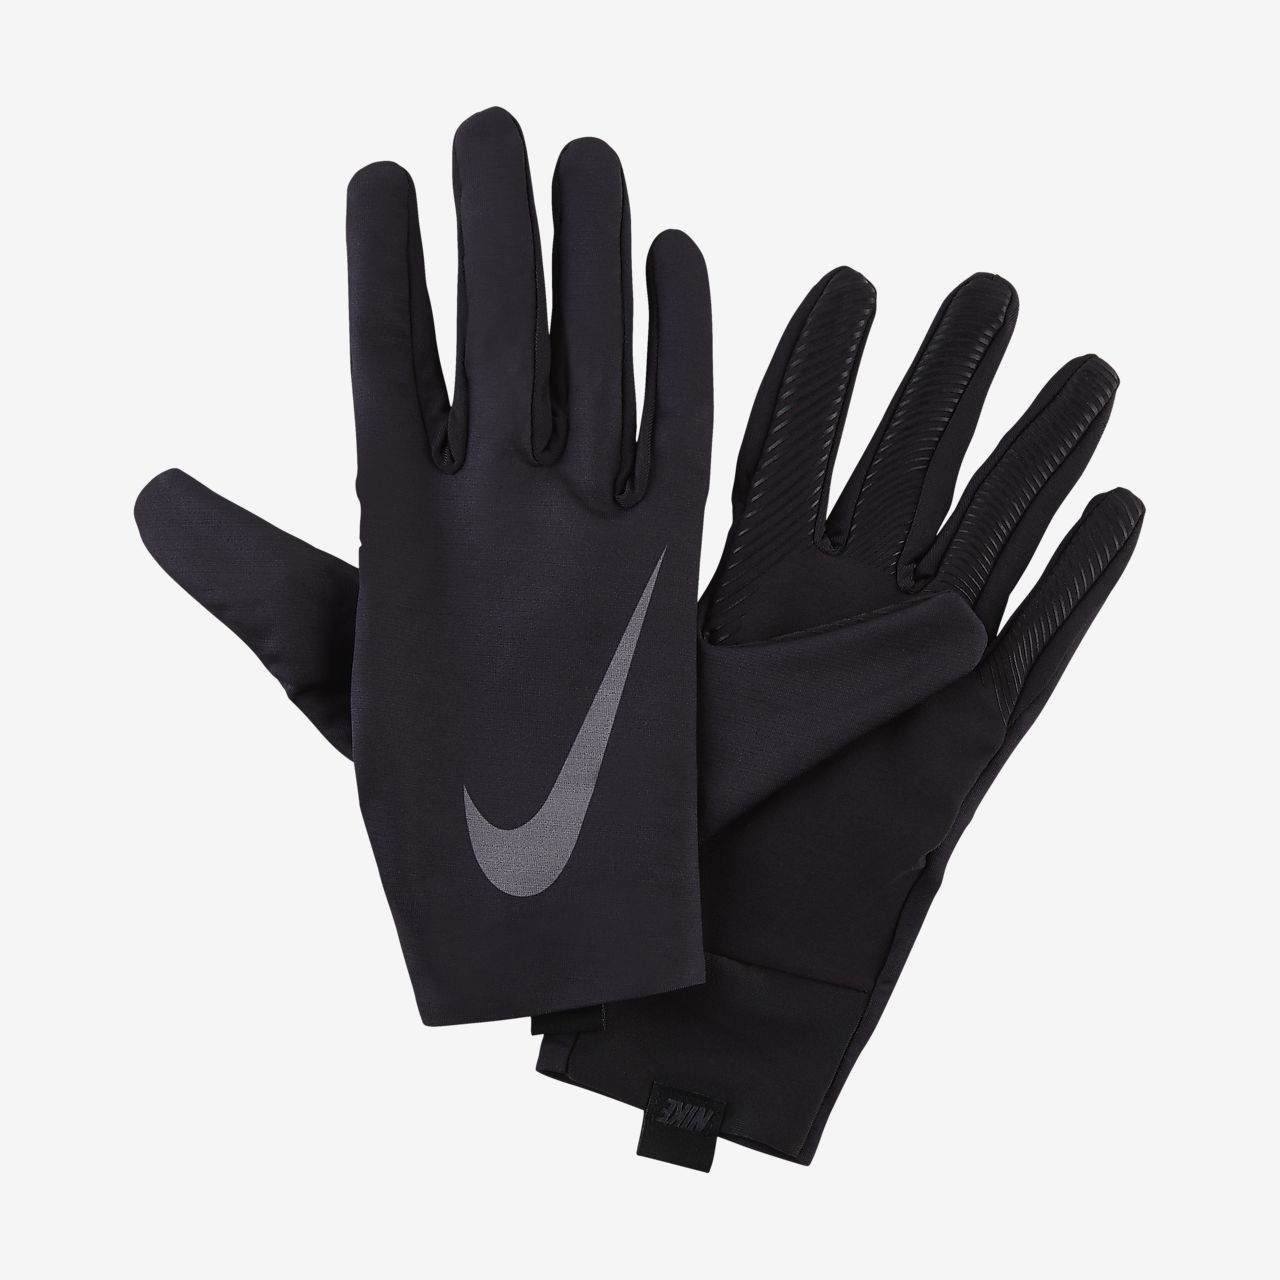 Nike Pro Warm Liner Men's Training Gloves